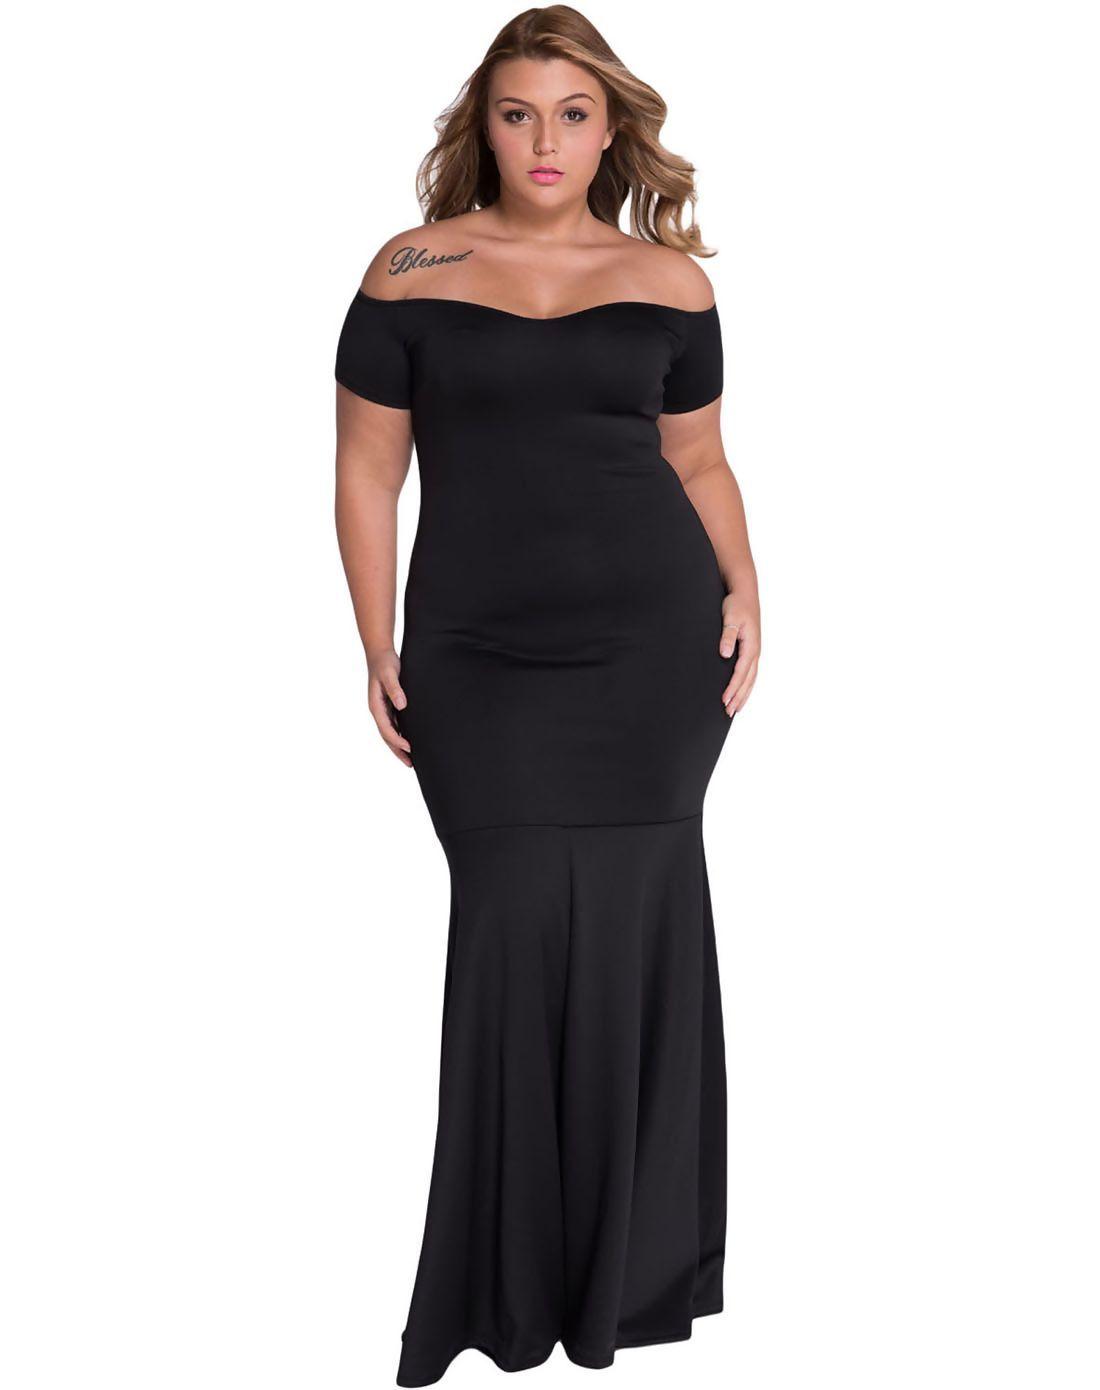 AdoreWe VIPme Bodycon DressesDesigner Dear Lover Black